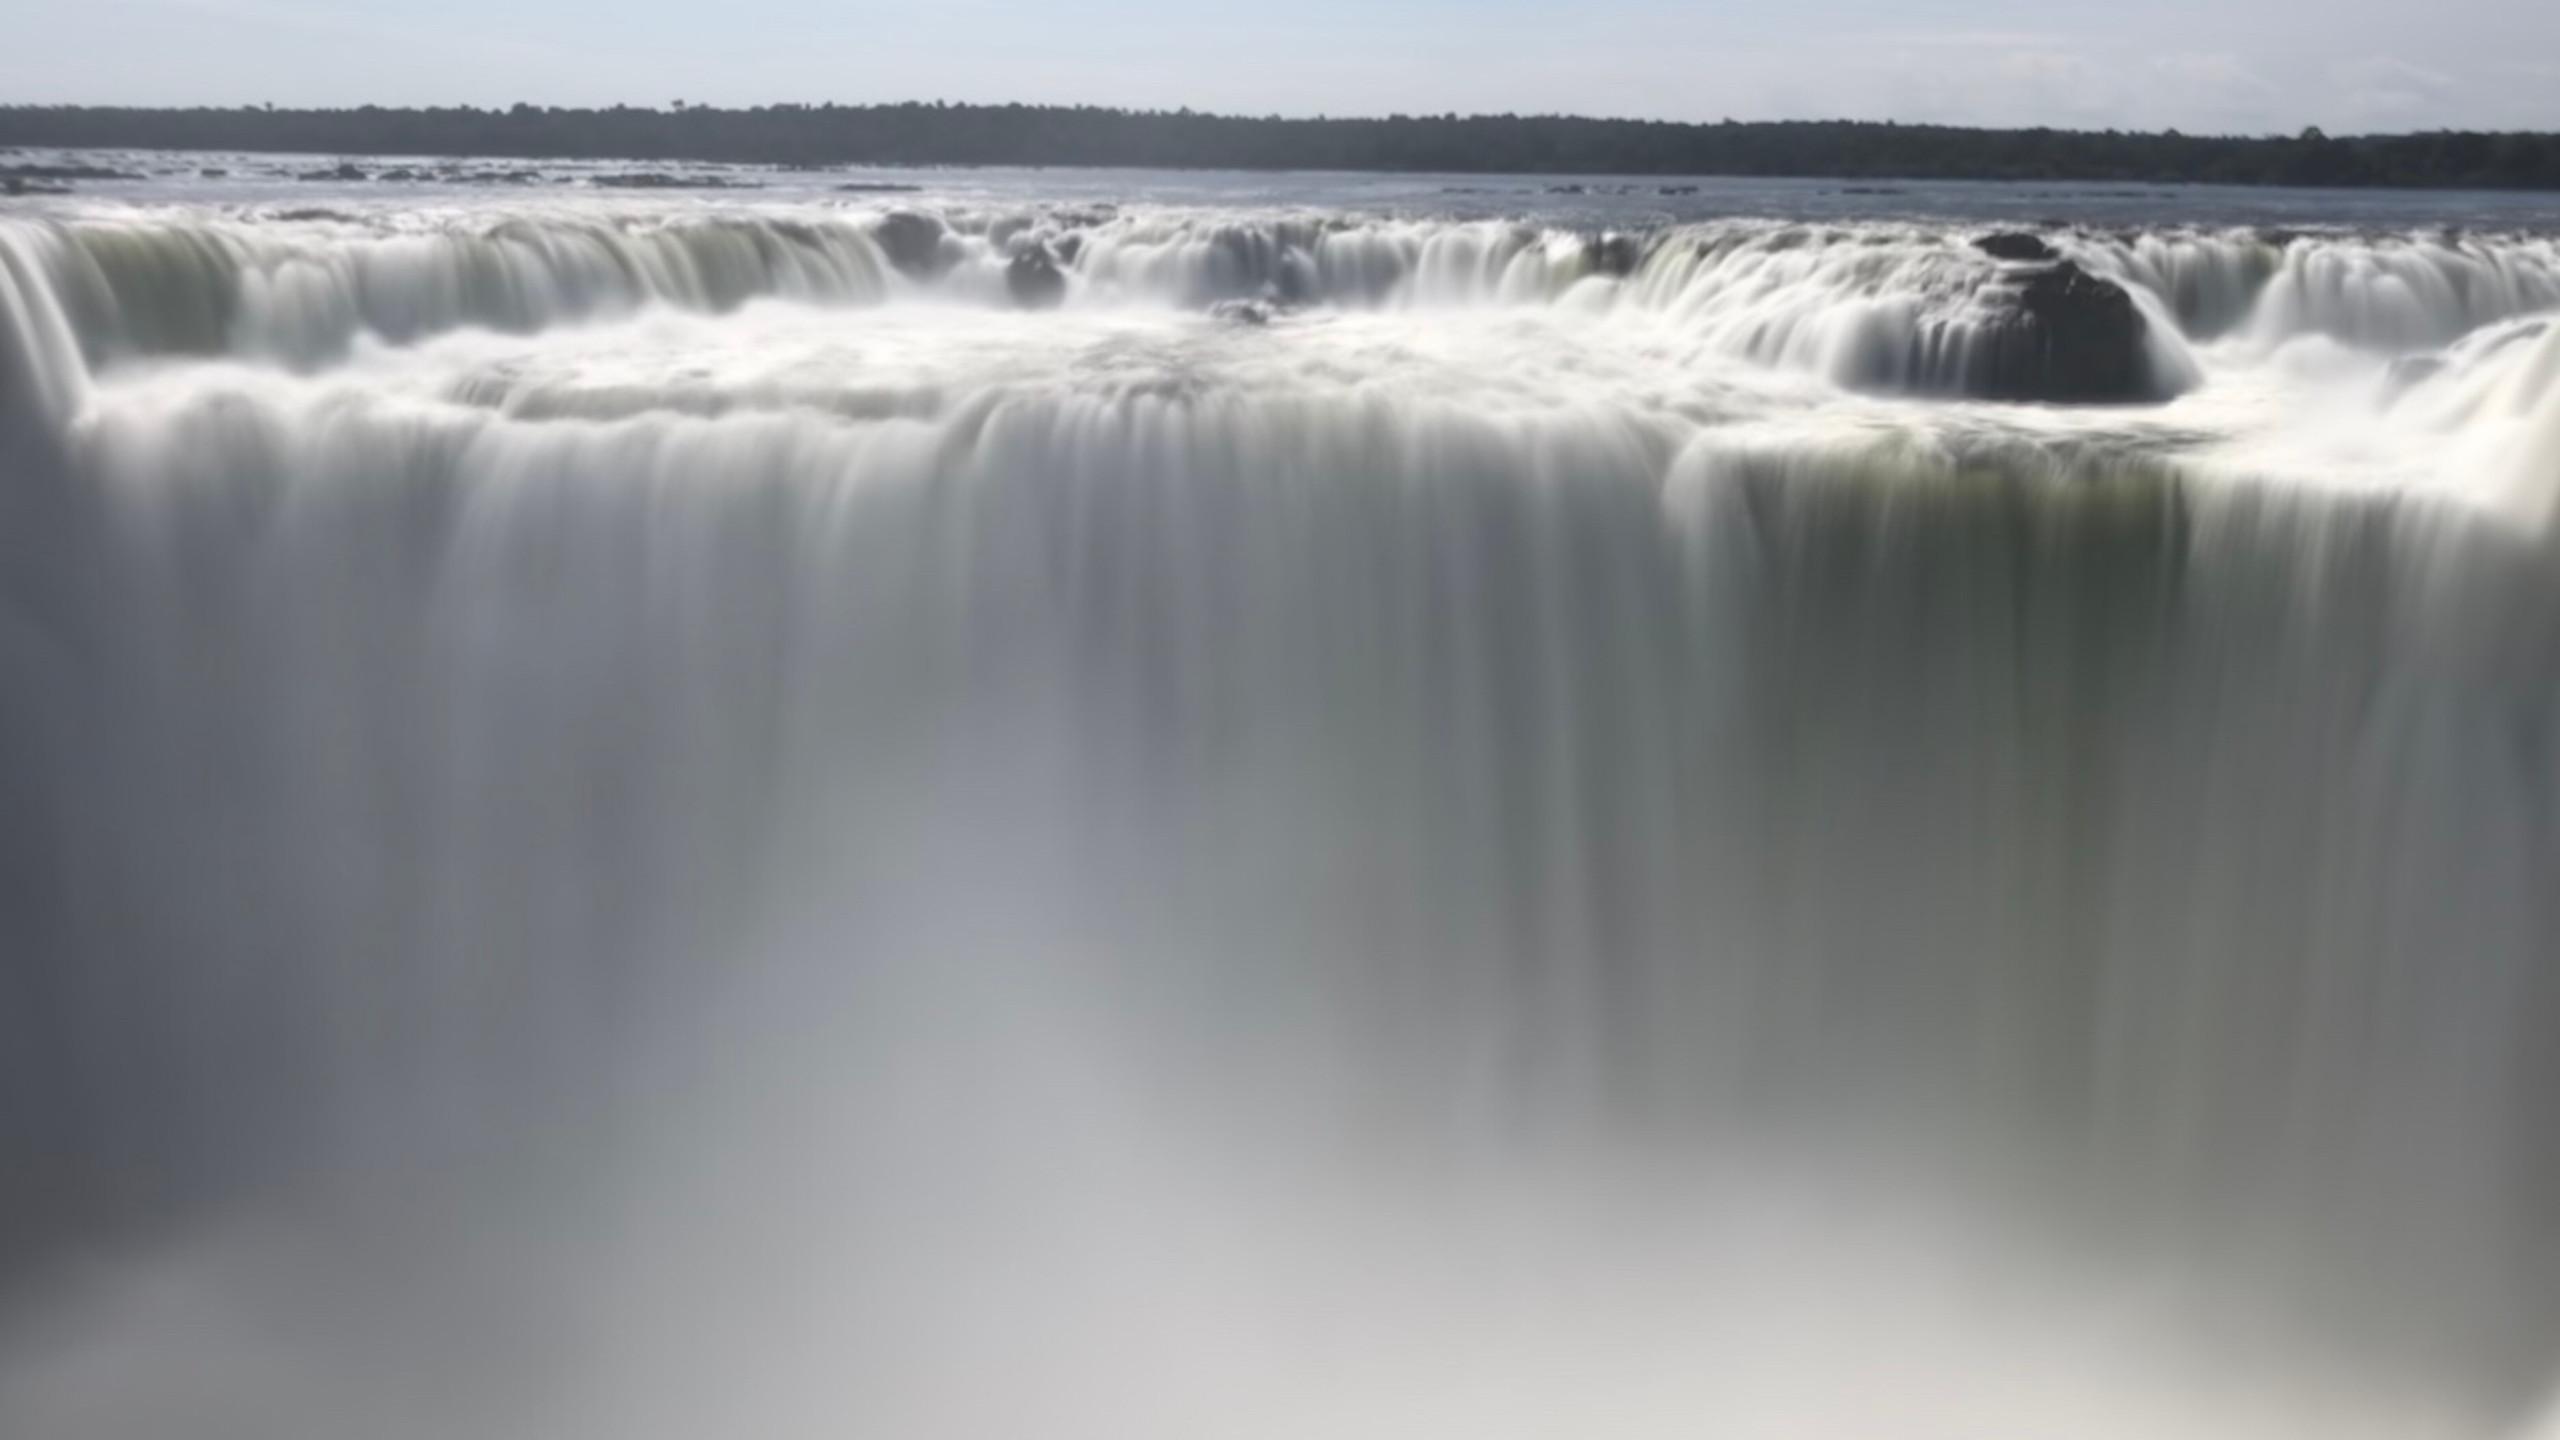 Wassermassen stürzen viele Meter ins Tal hinunter